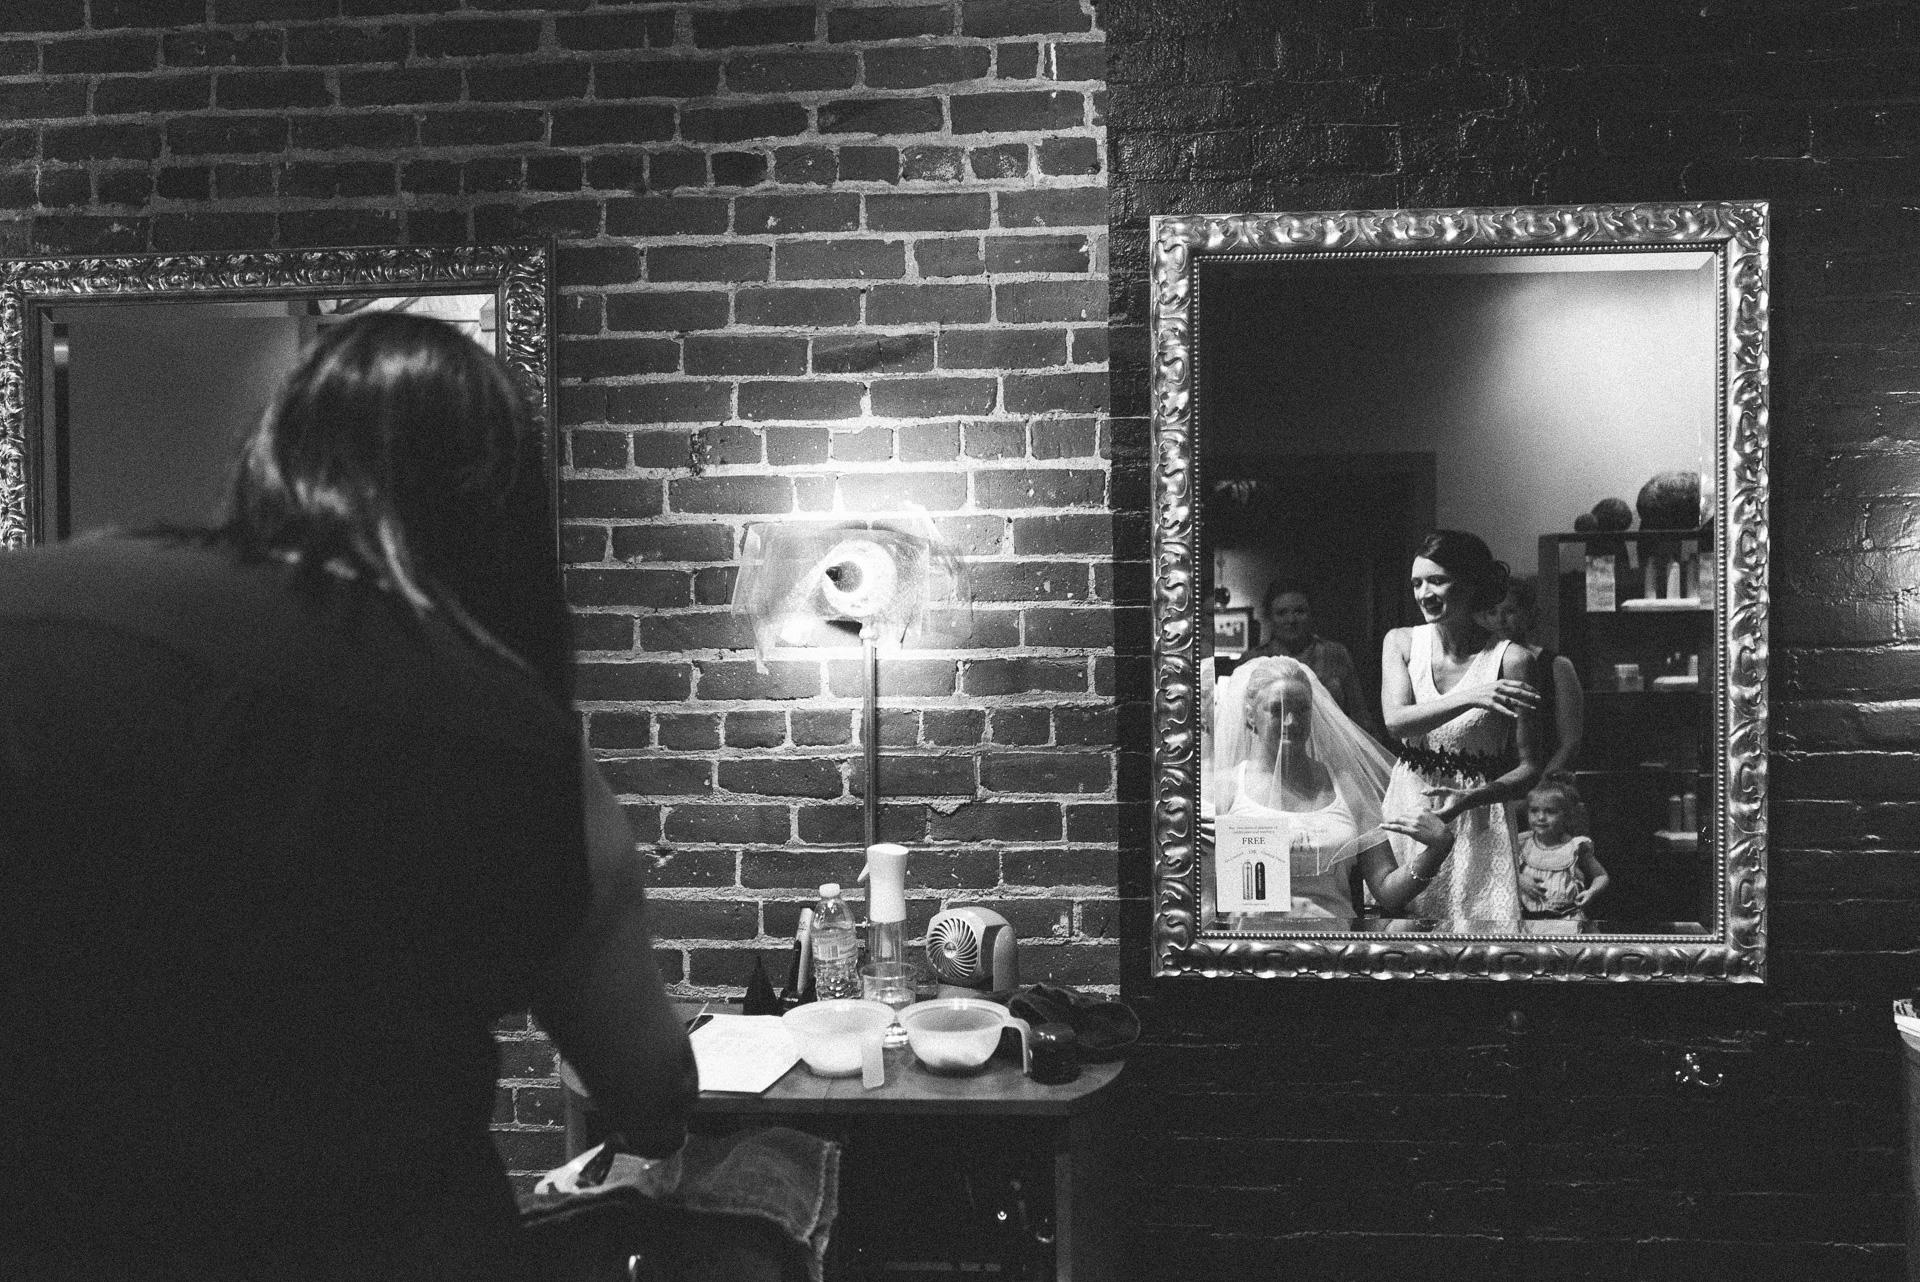 Dayton Wedding Photographer - Bride Veil